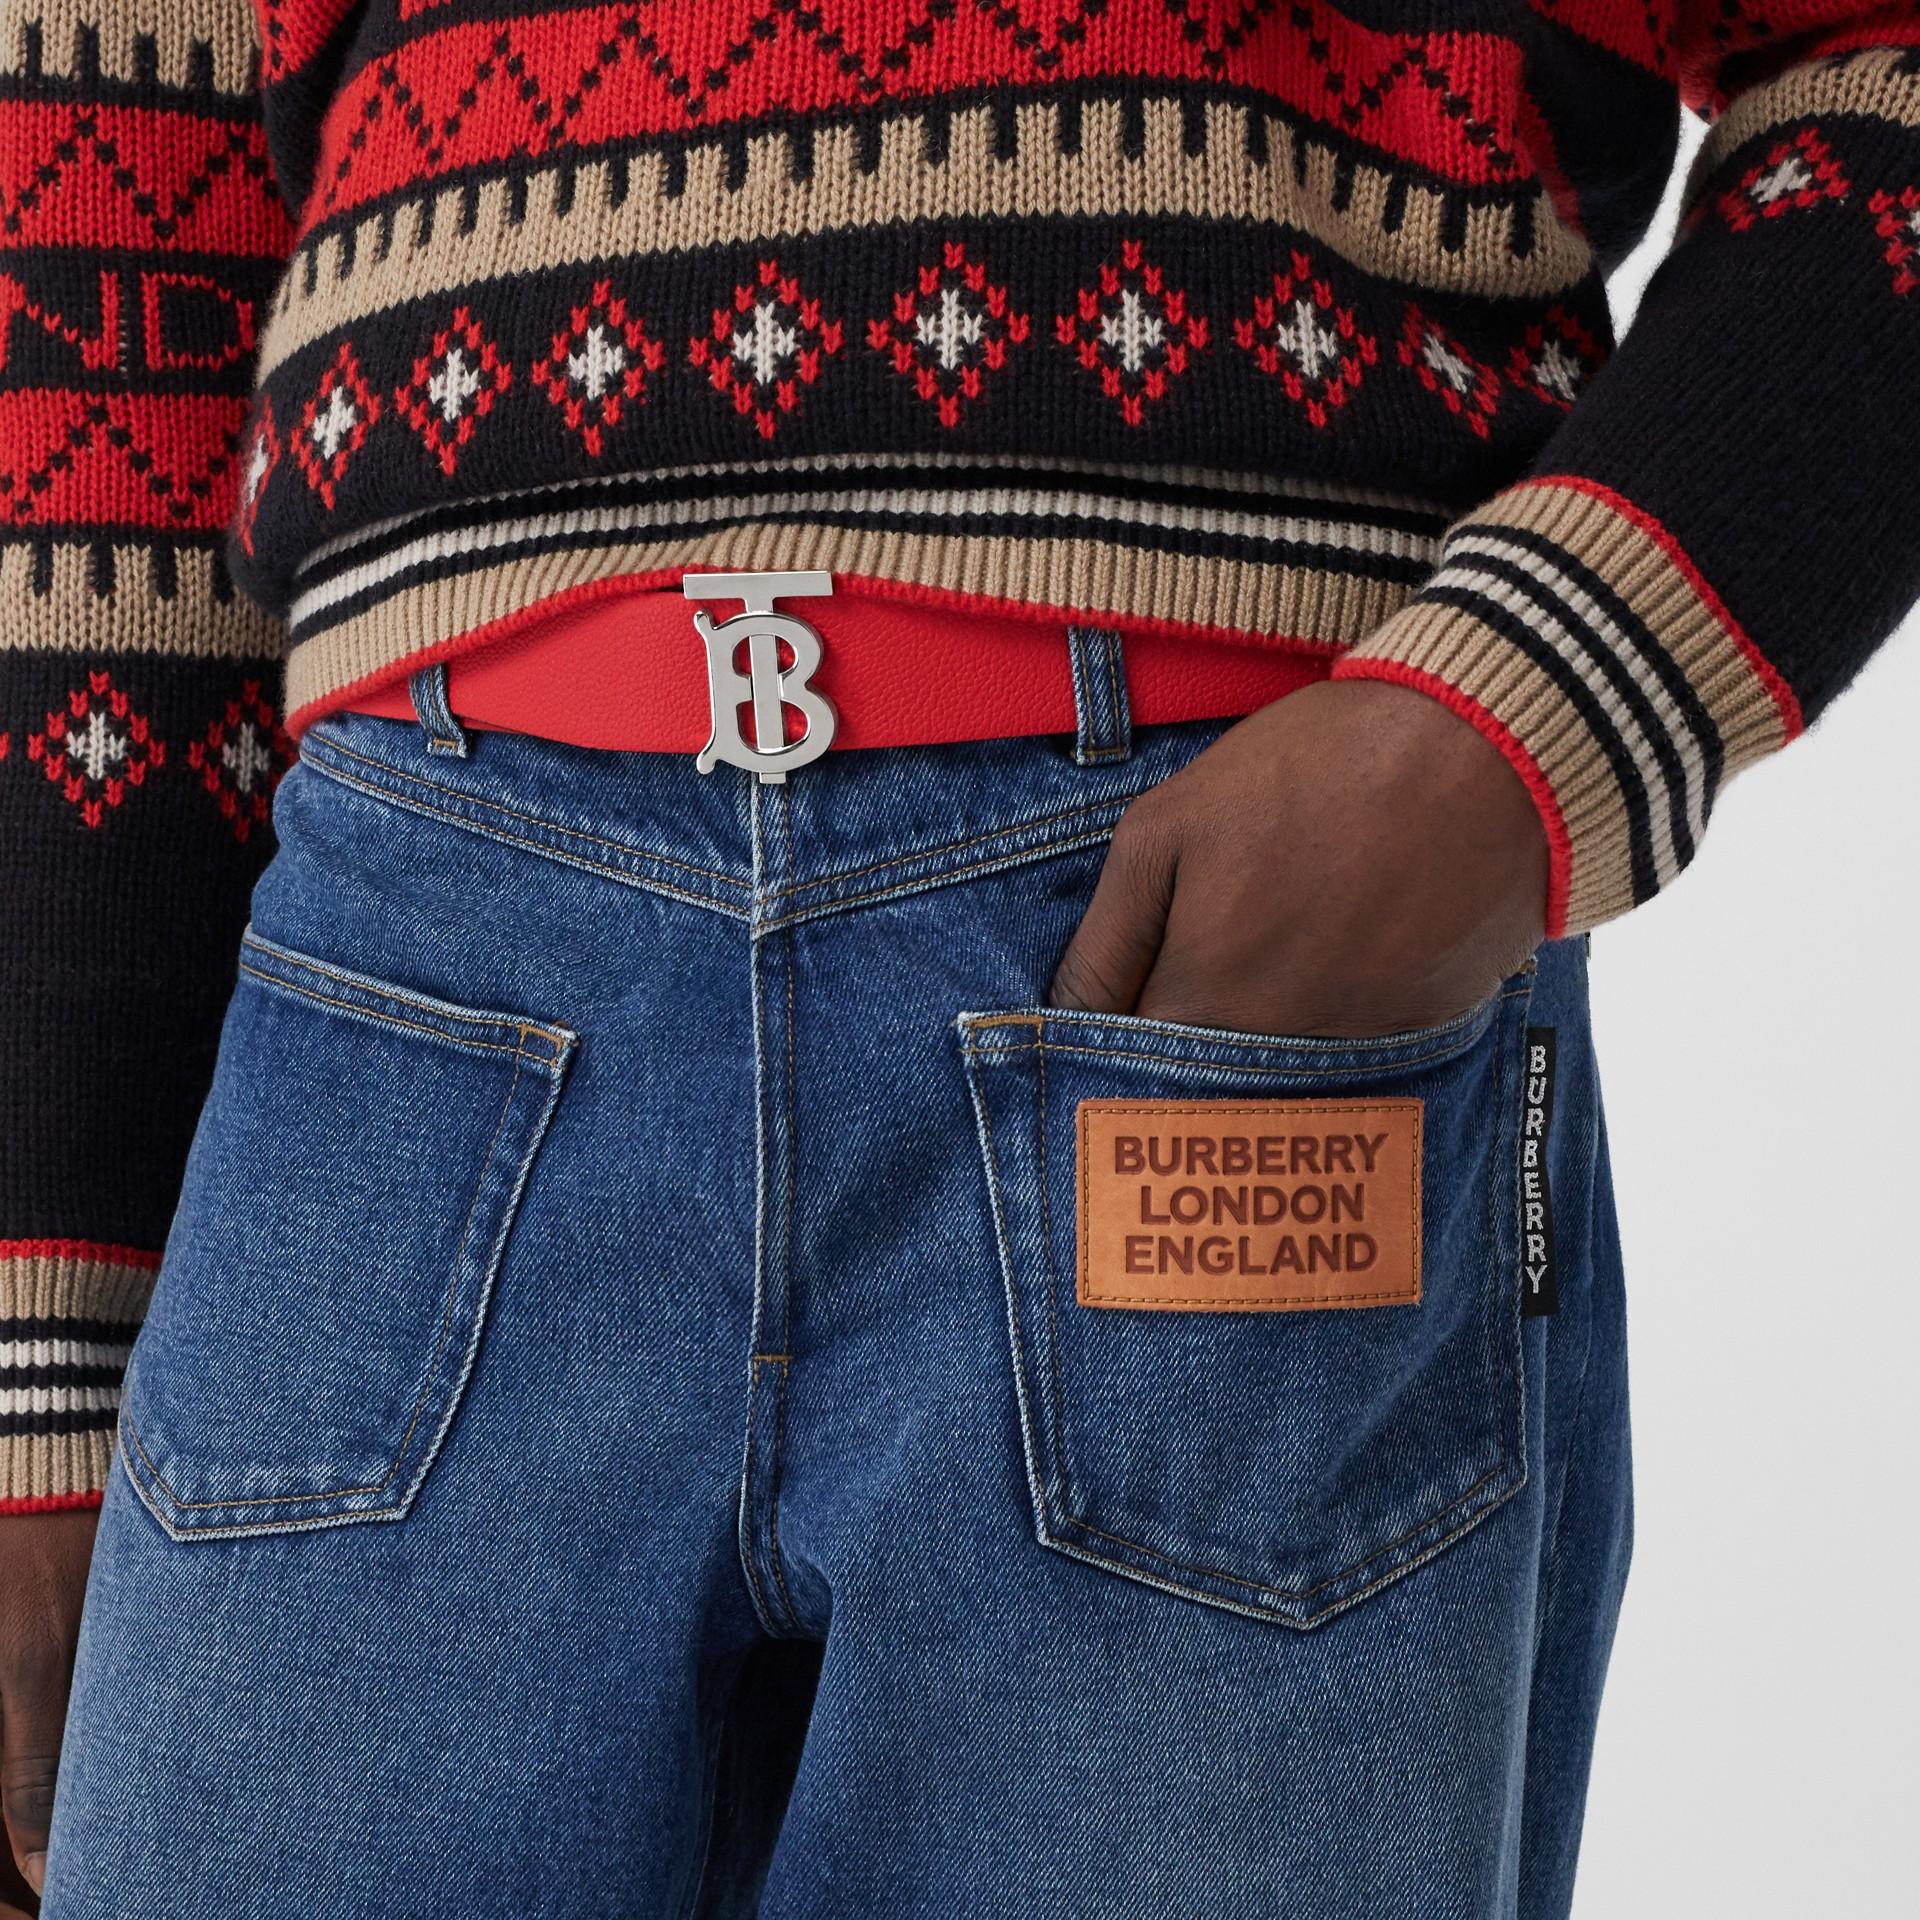 Reversible Monogram Motif Grainy Leather Belt in Military Red/black - Men | Burberry United Kingdom - gallery image 2